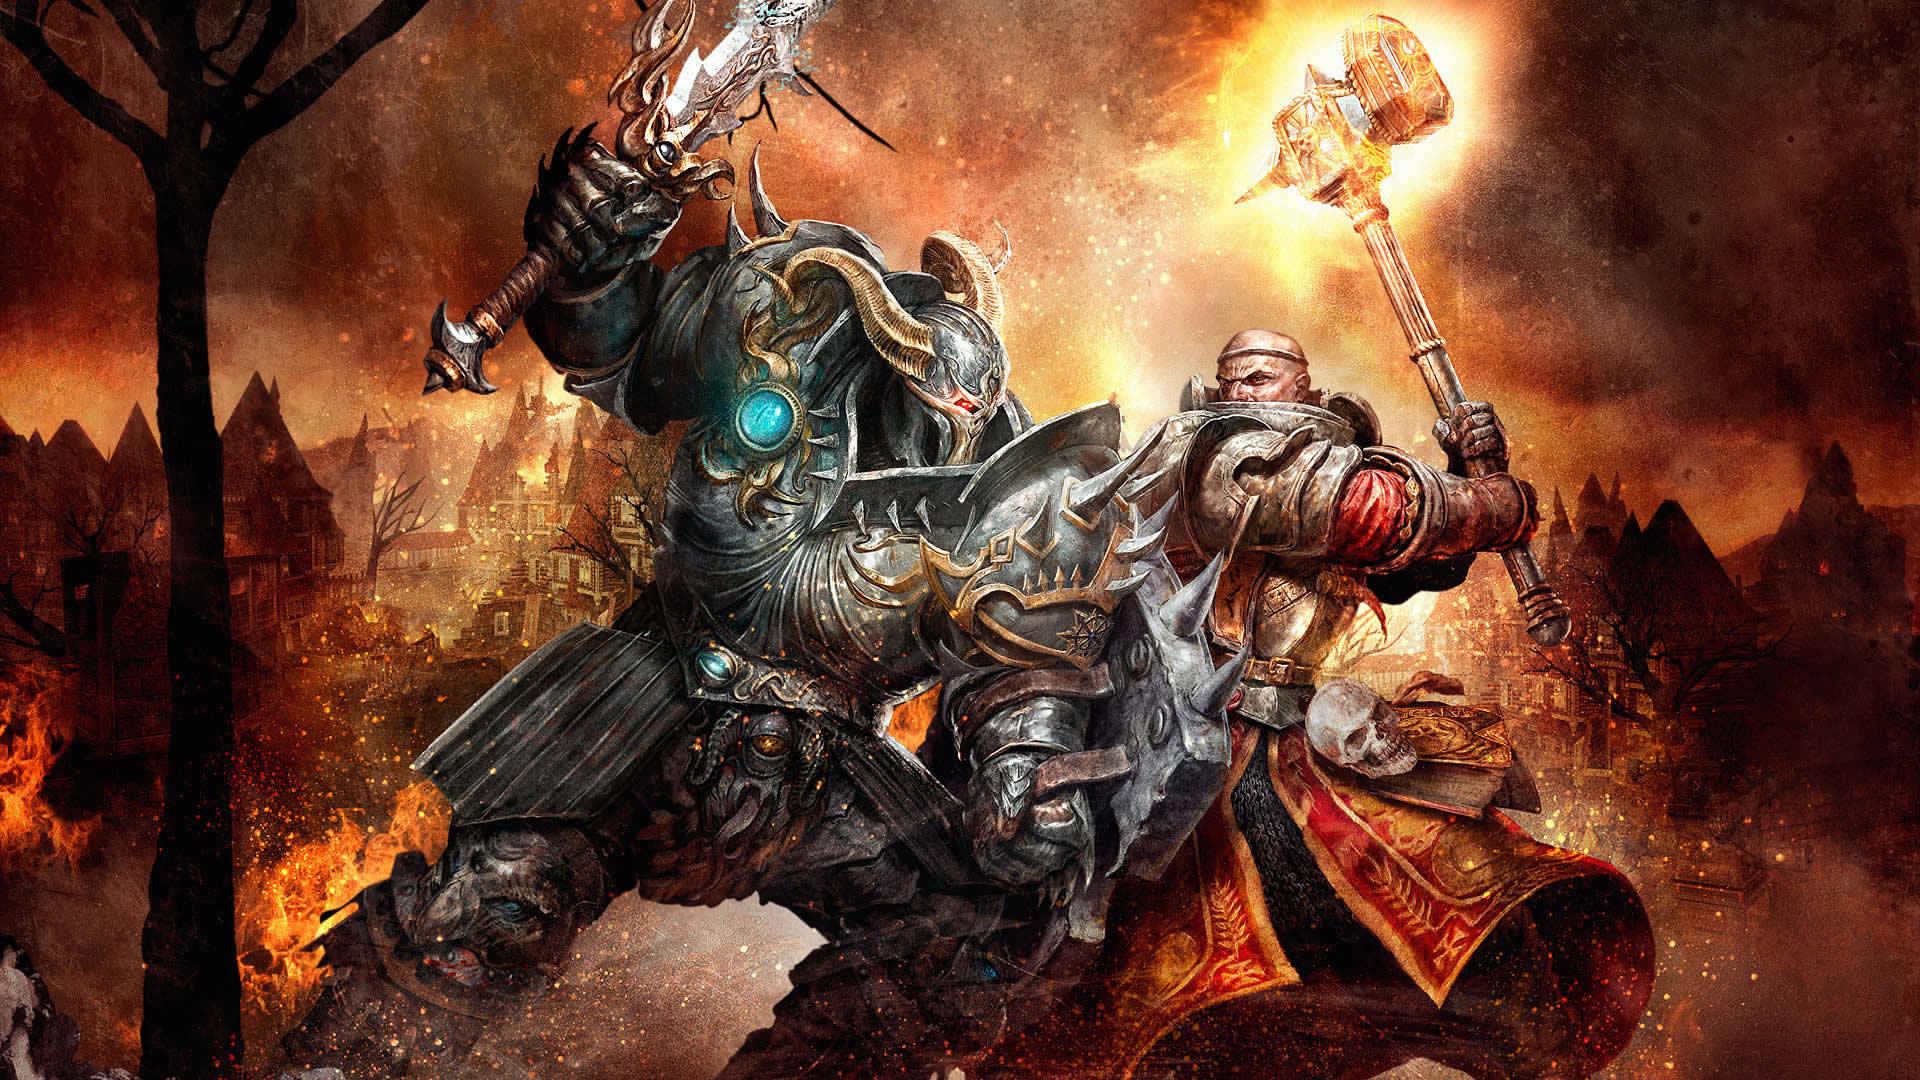 Full Hd Wallpapers Game Battle Scenes - Hellgate